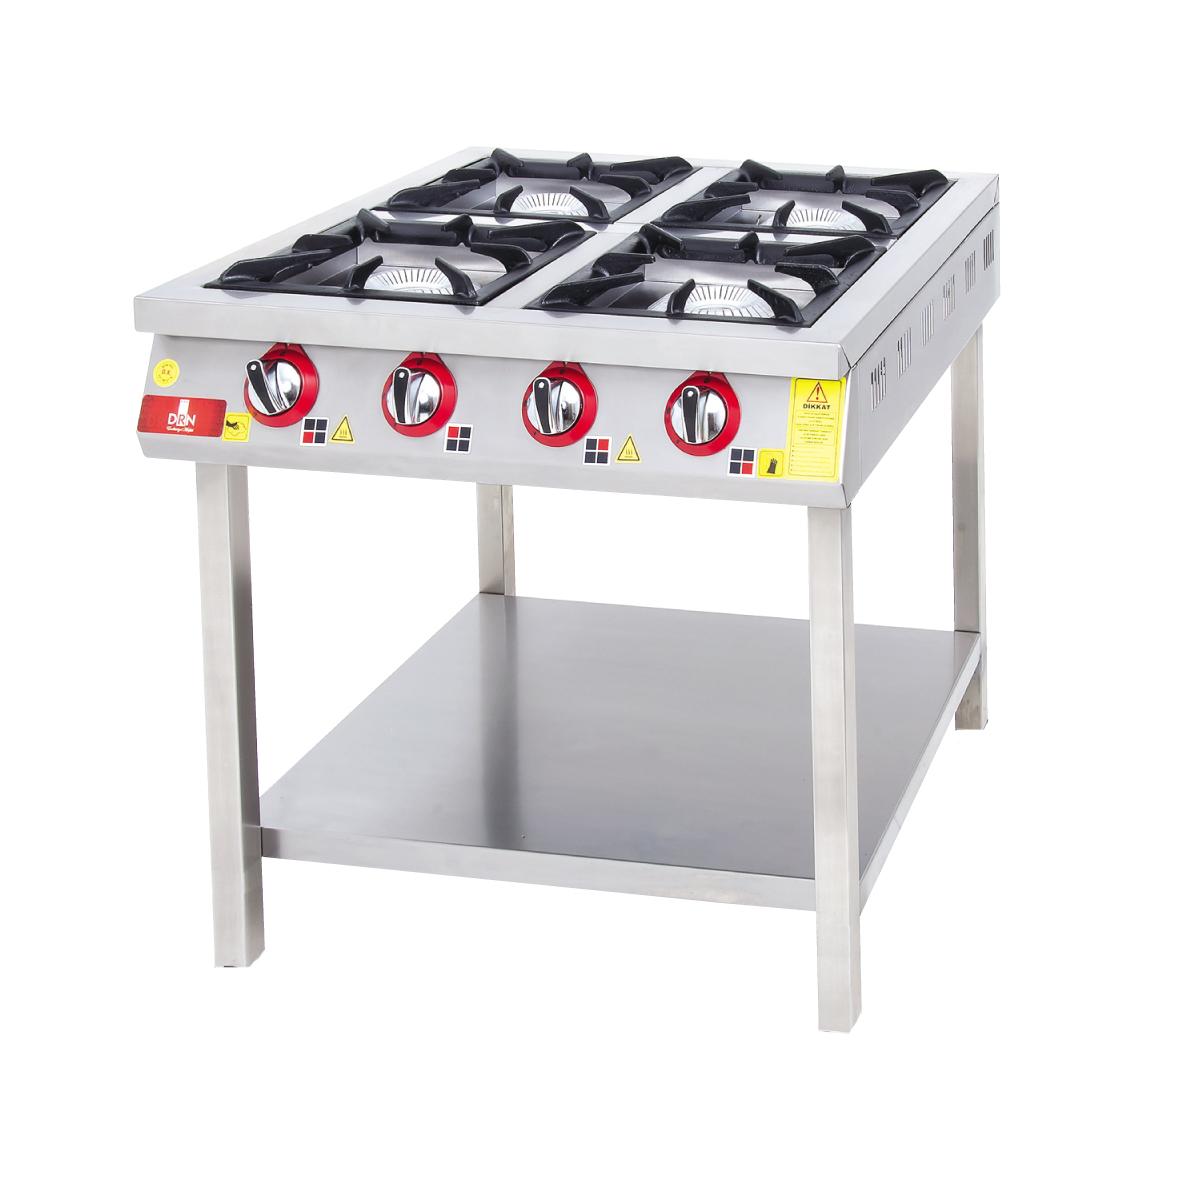 Range and Bottom-Shelf - 4 Burners - 80x80 - Gas